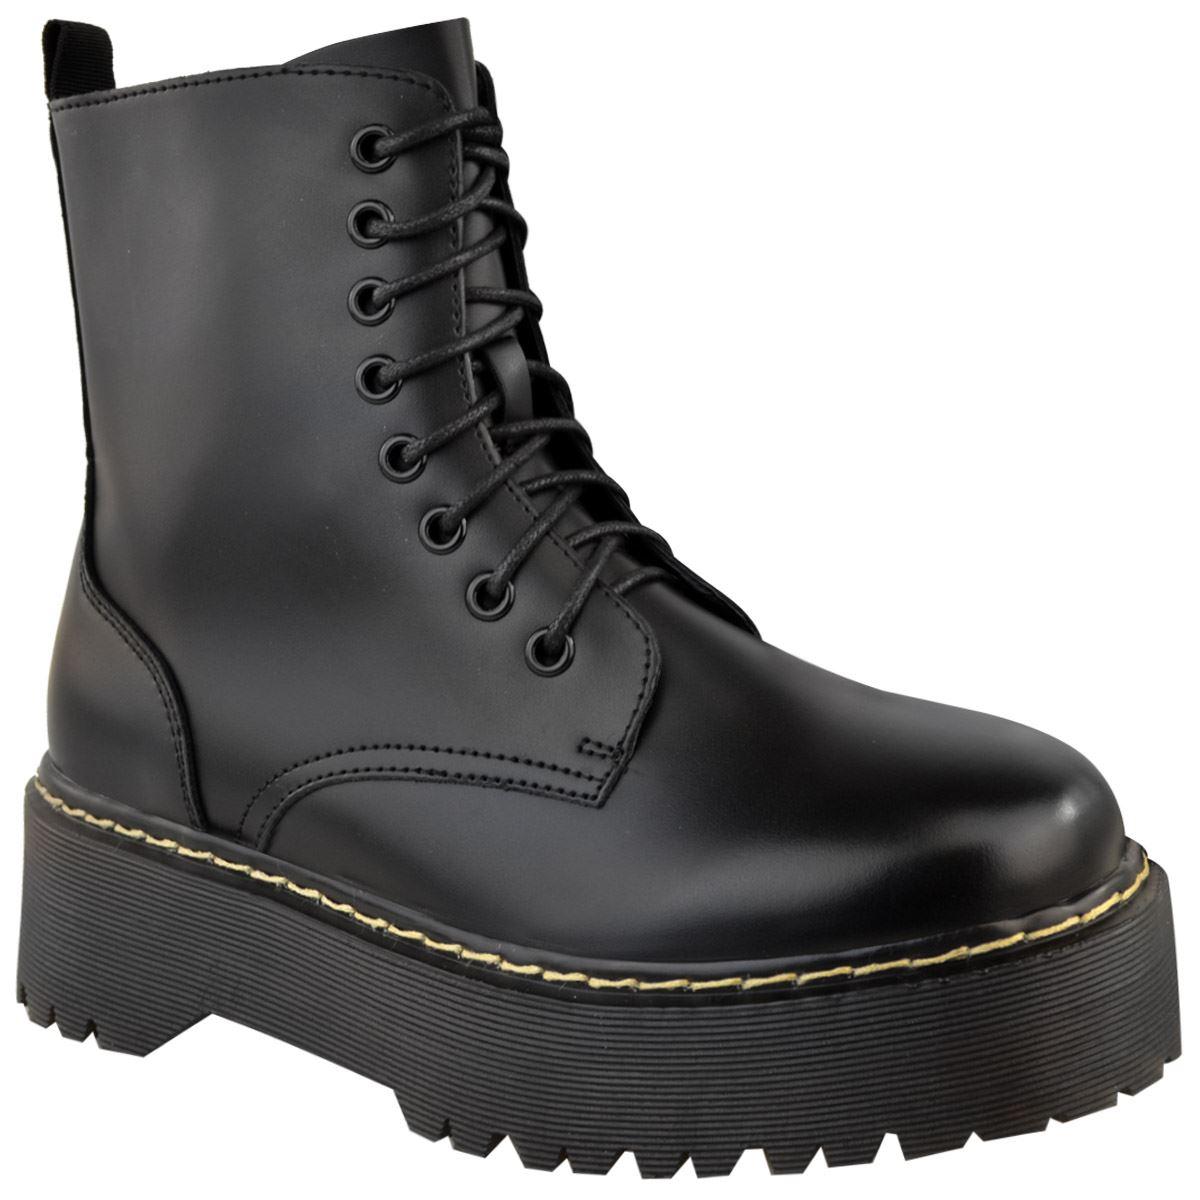 Womens-Ladies-Chunky-Lace-Up-Ankle-Boots-Platform-Icon-Retro-Goth-Punk-Black miniatuur 3